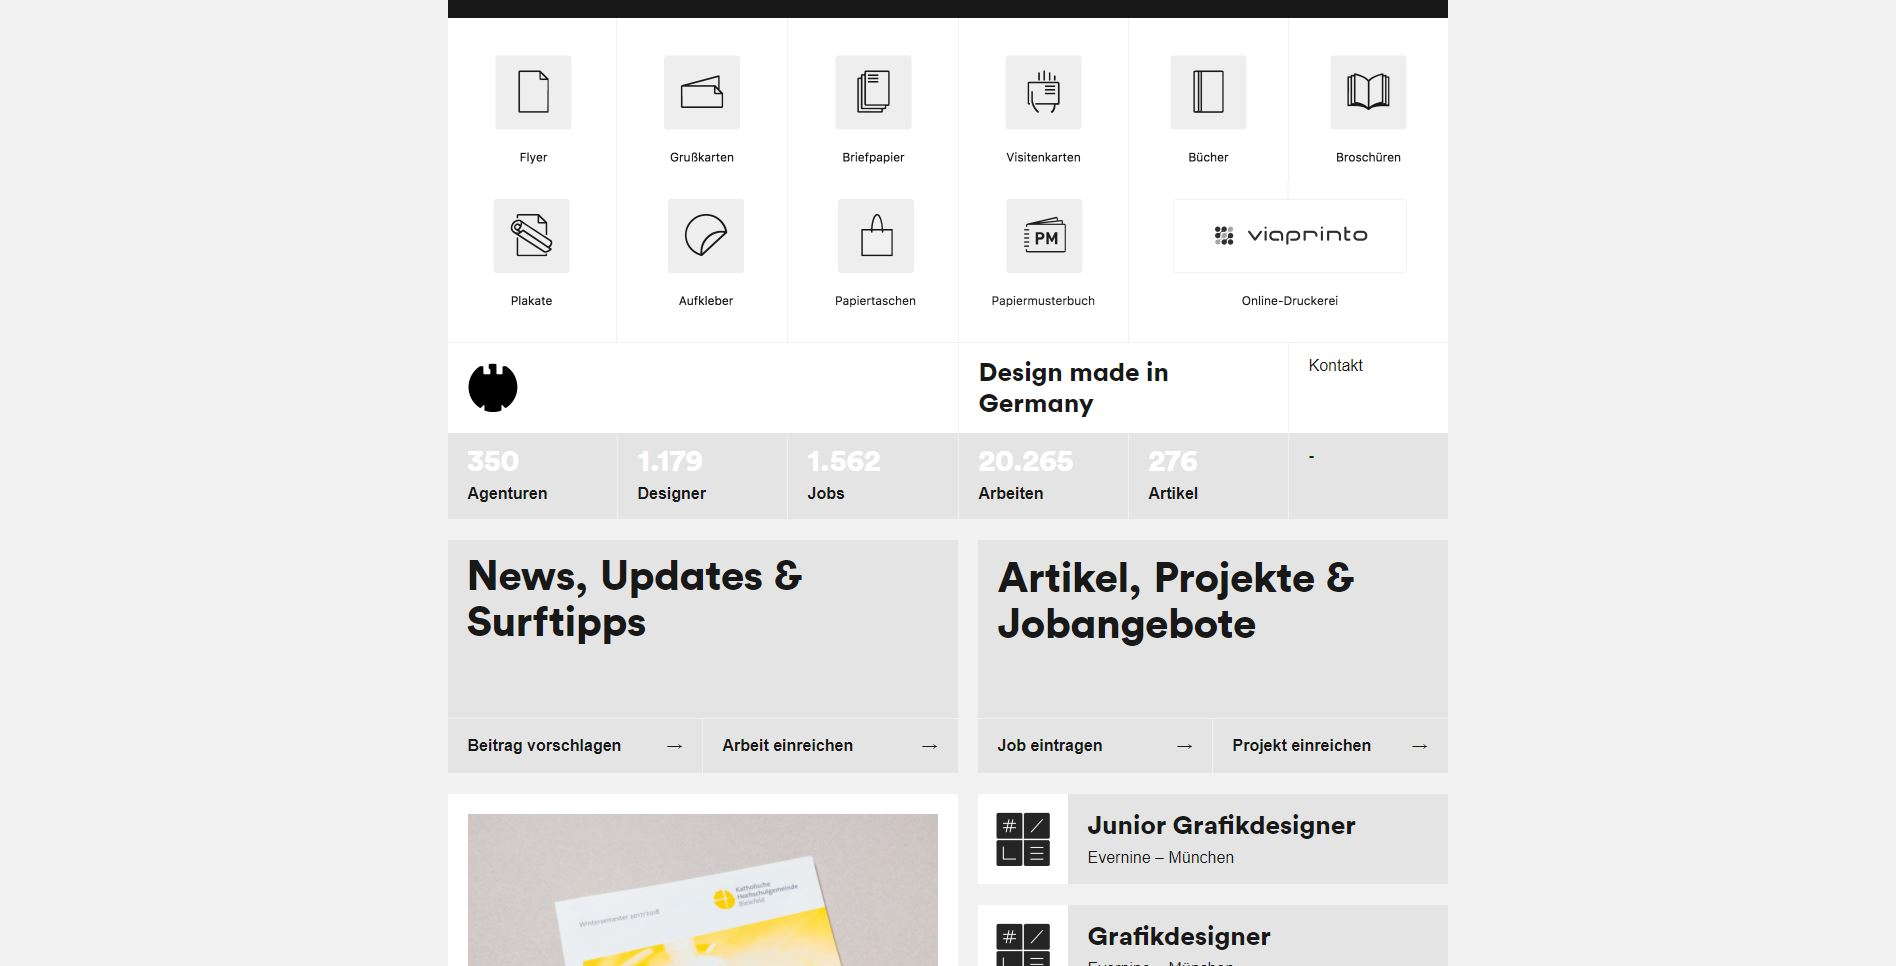 alternativen zu design made in germany die besten design made in germany alternativen 2019. Black Bedroom Furniture Sets. Home Design Ideas